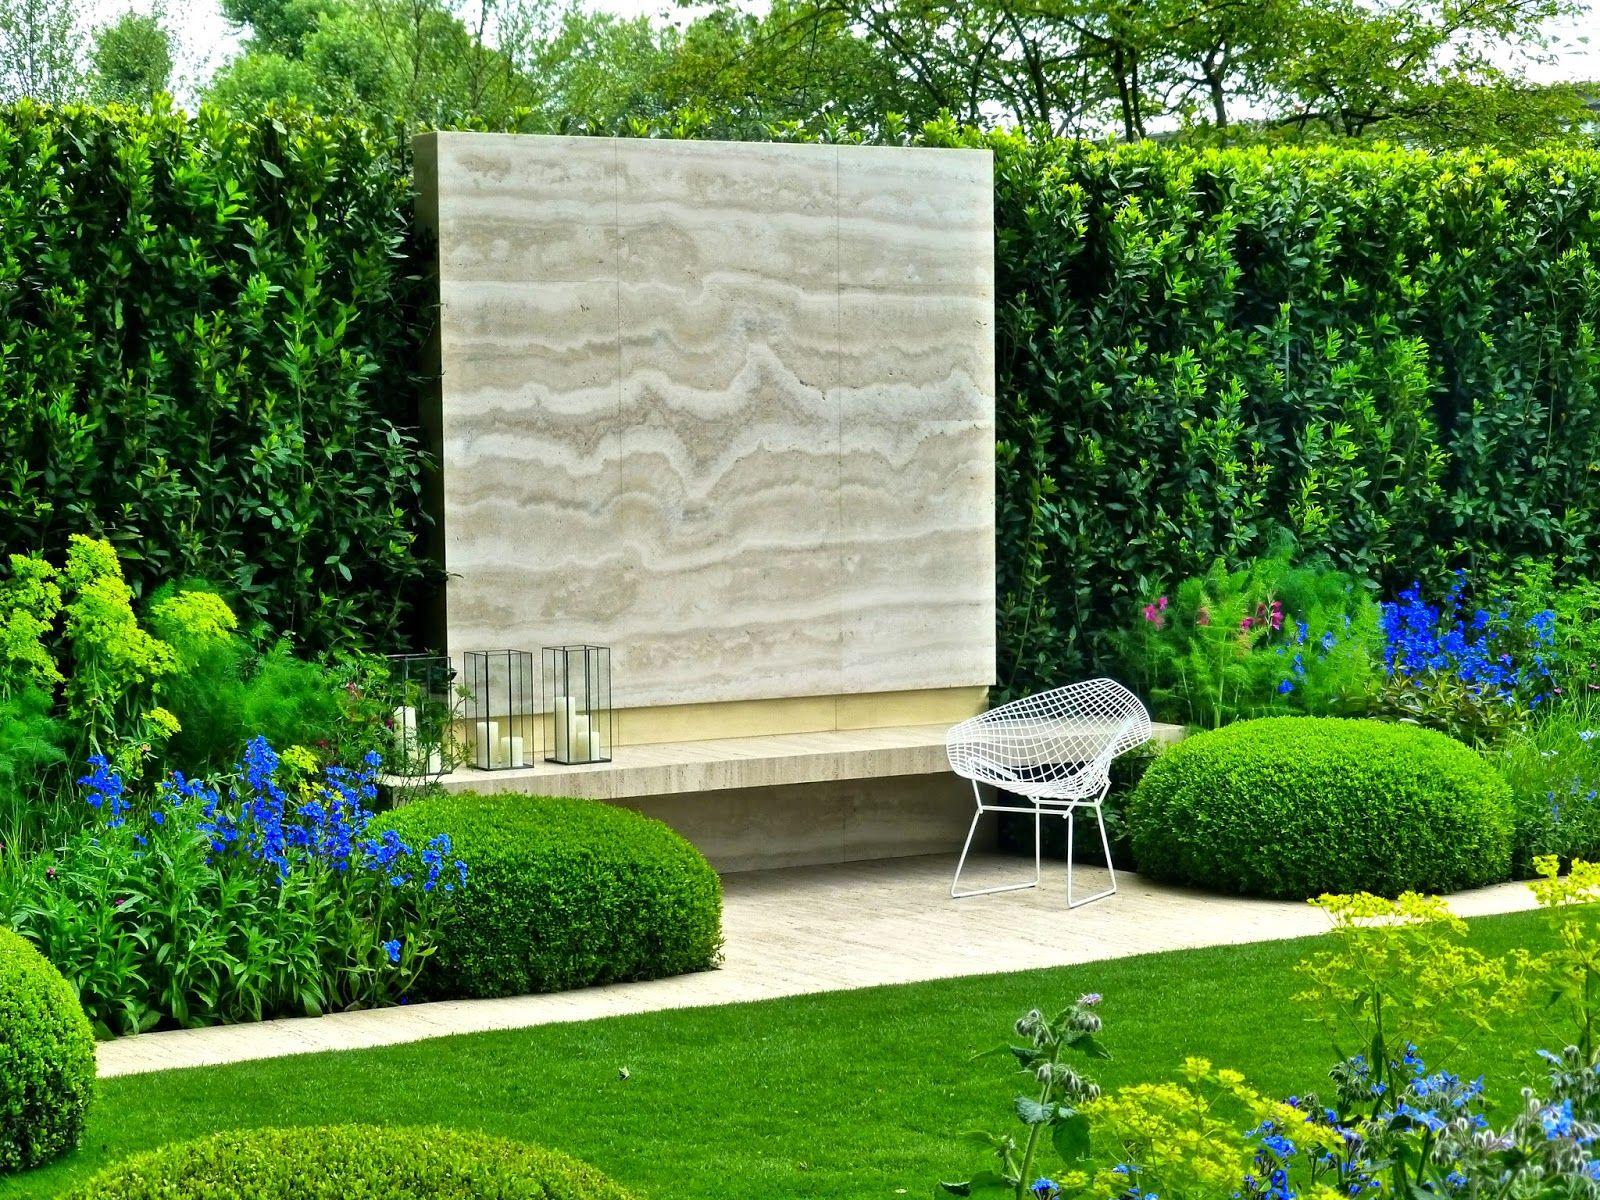 del buono gazerwitz landscape architecture telegraph garden rhs chelsea 2014 - Garden Ideas 2014 Uk